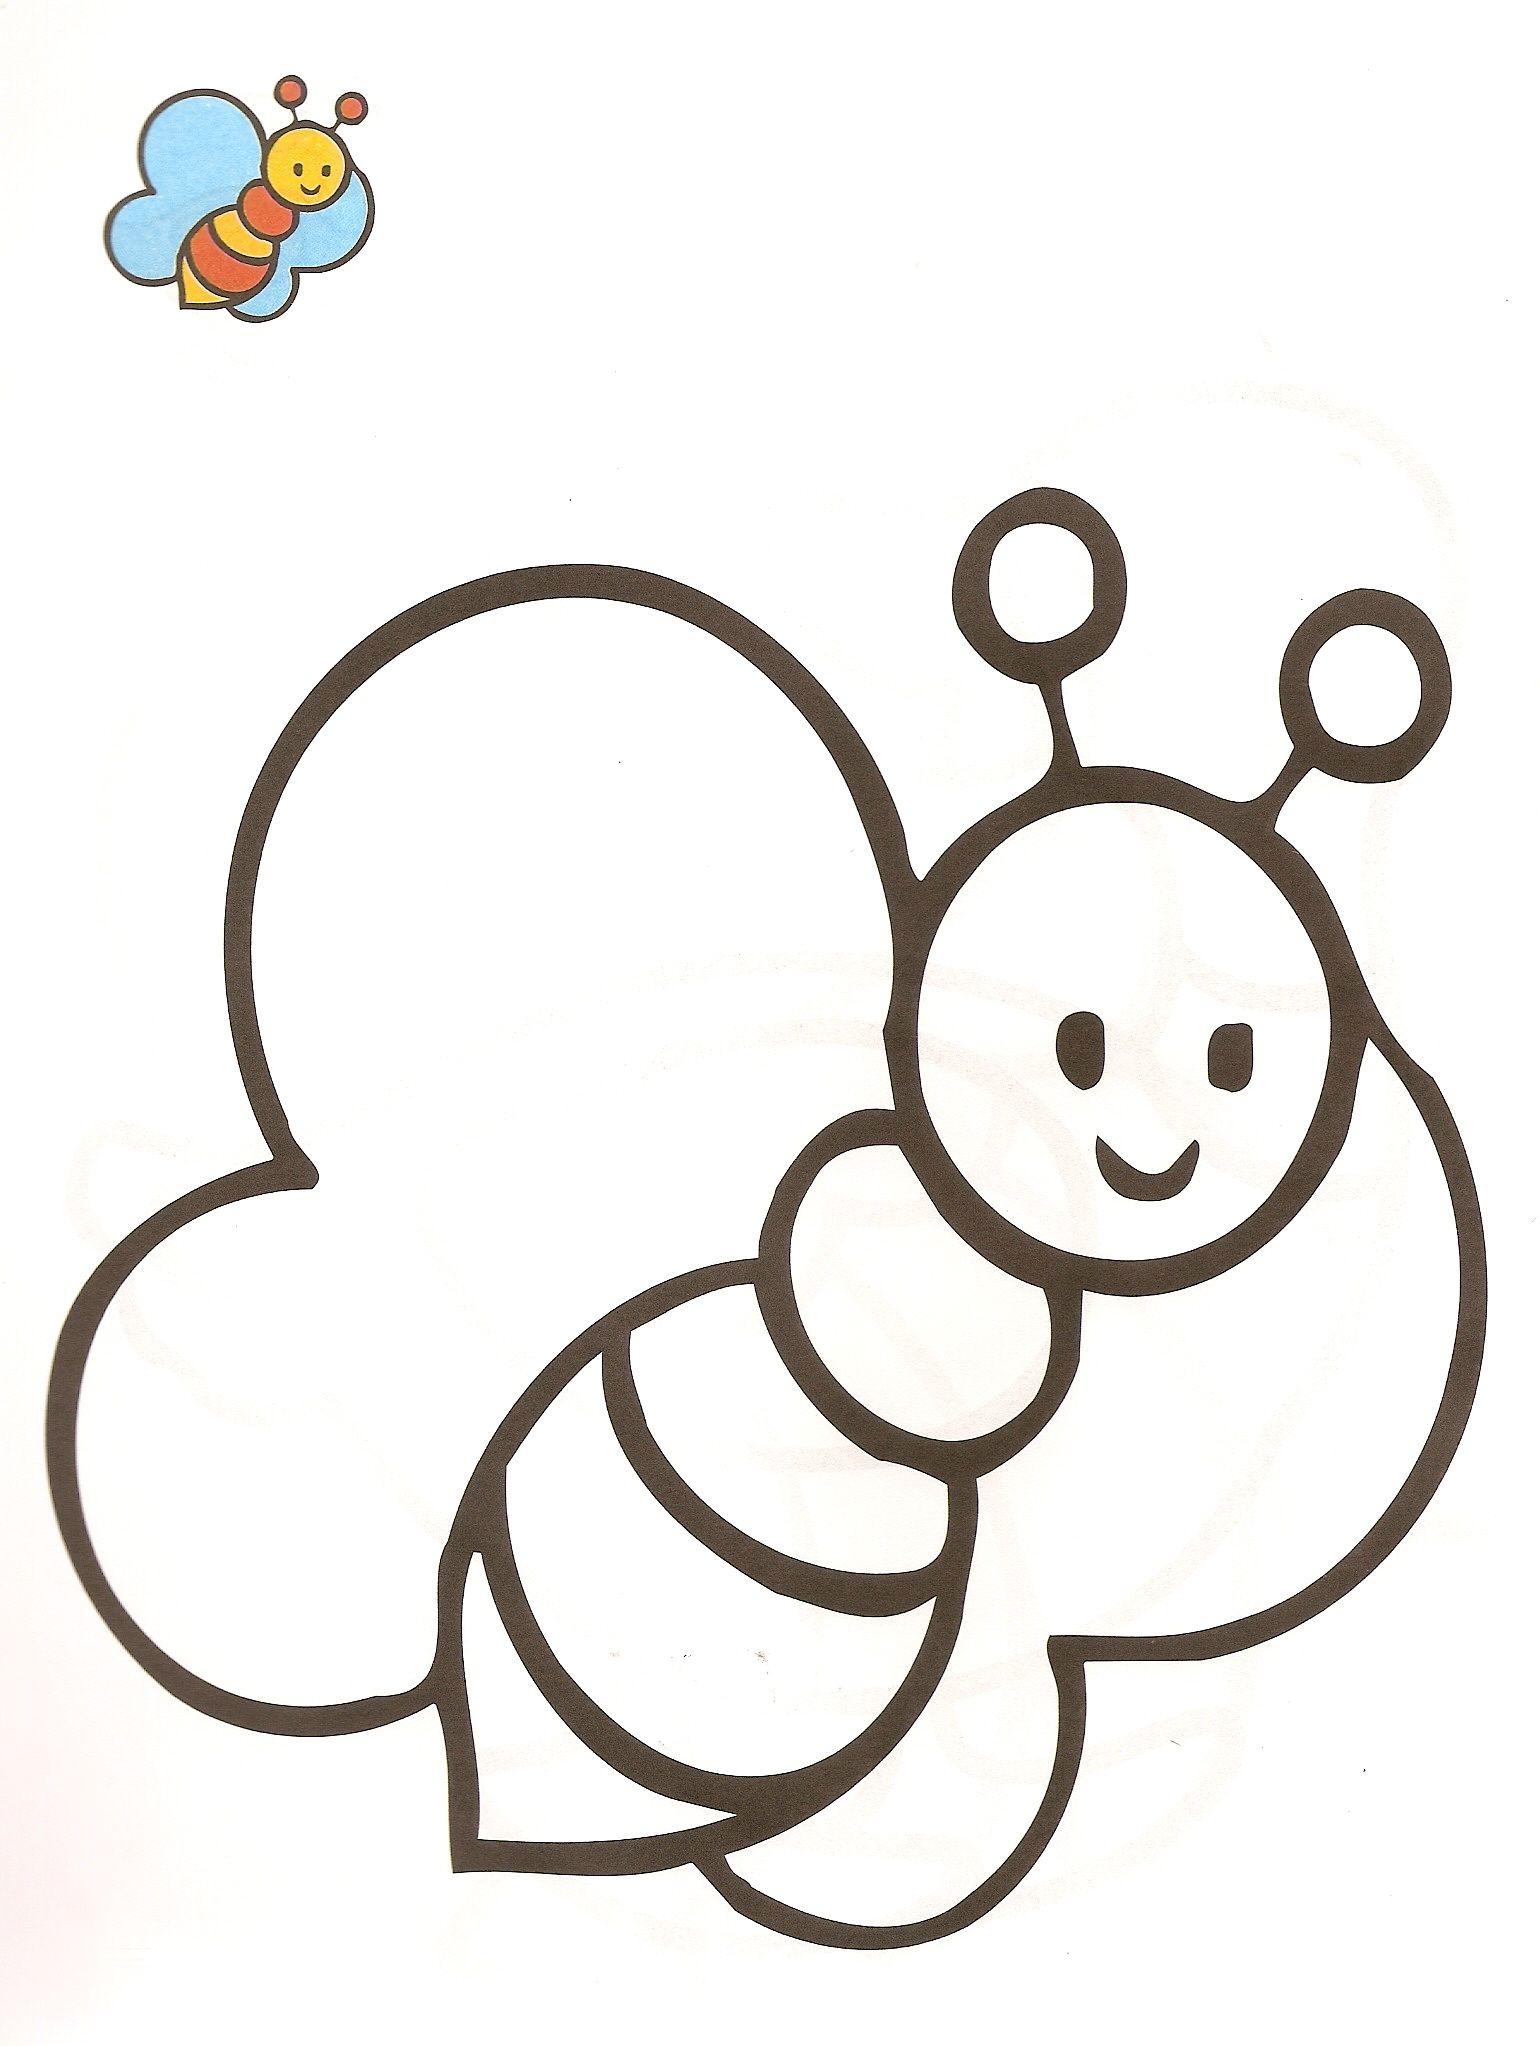 Worksheet. Dibujos de la Abeja maya para colorear y pintar  La abeja maya